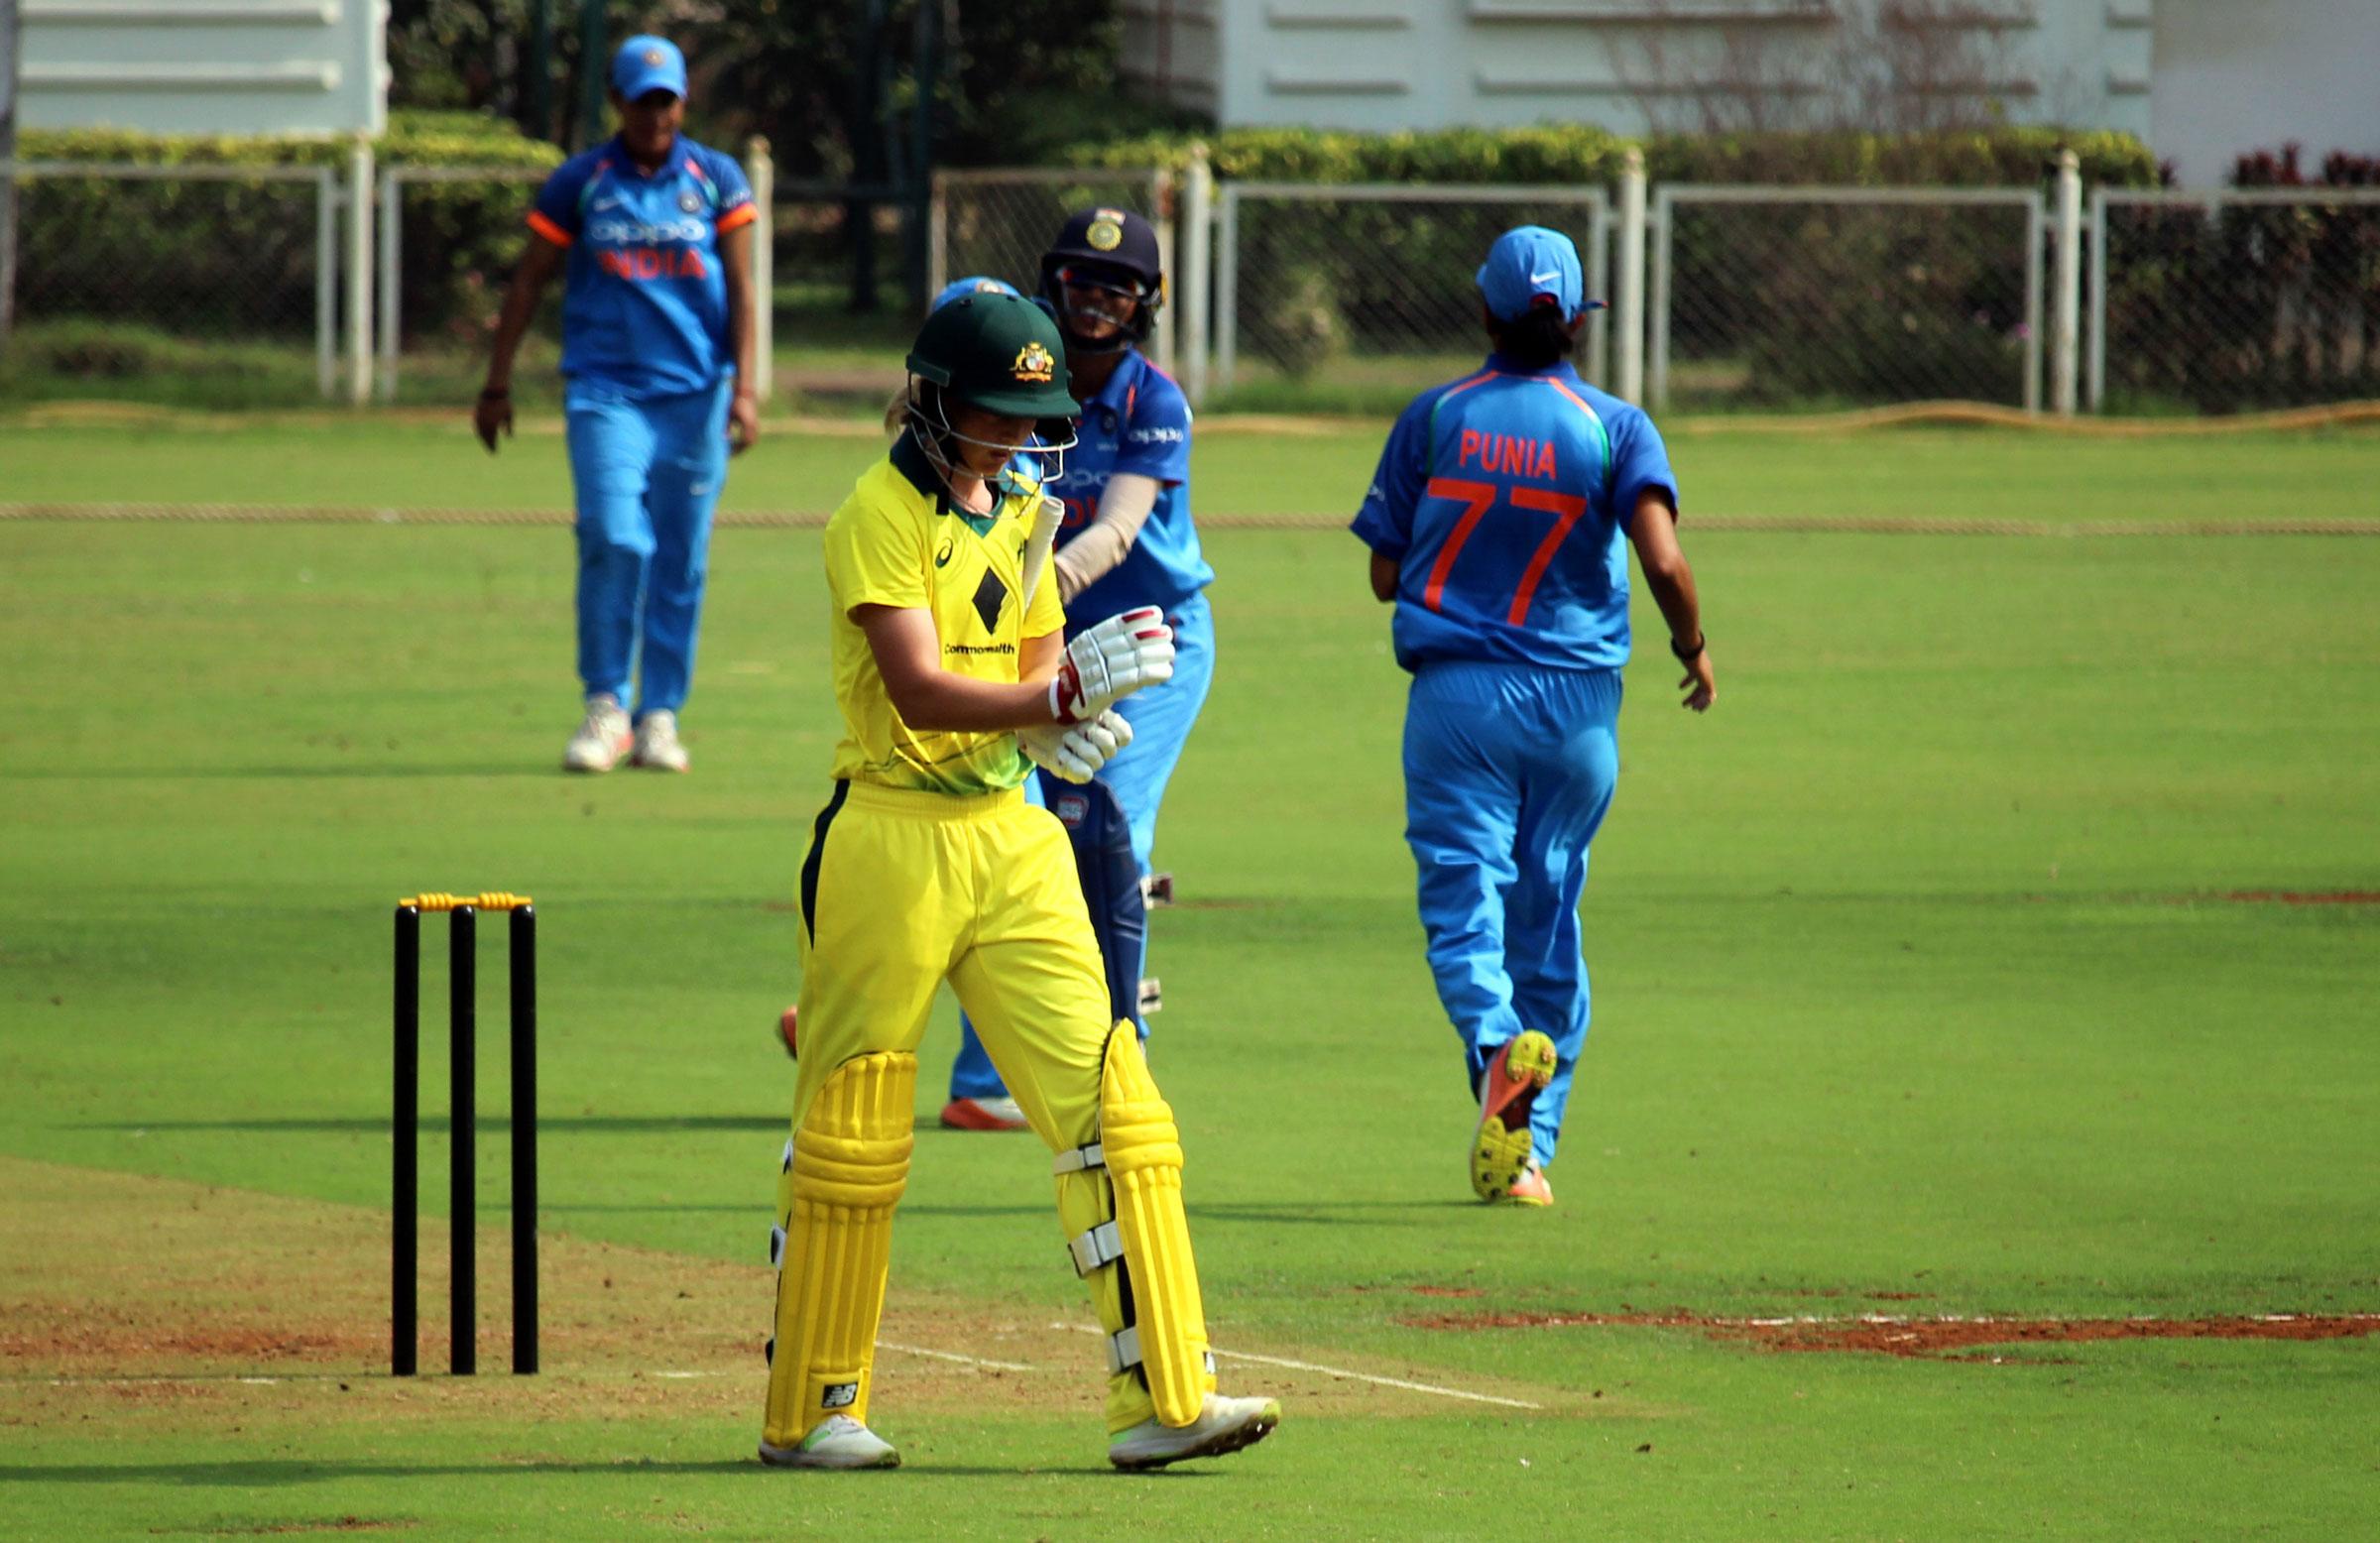 Lanning departs after falling for one // cricket.com.au